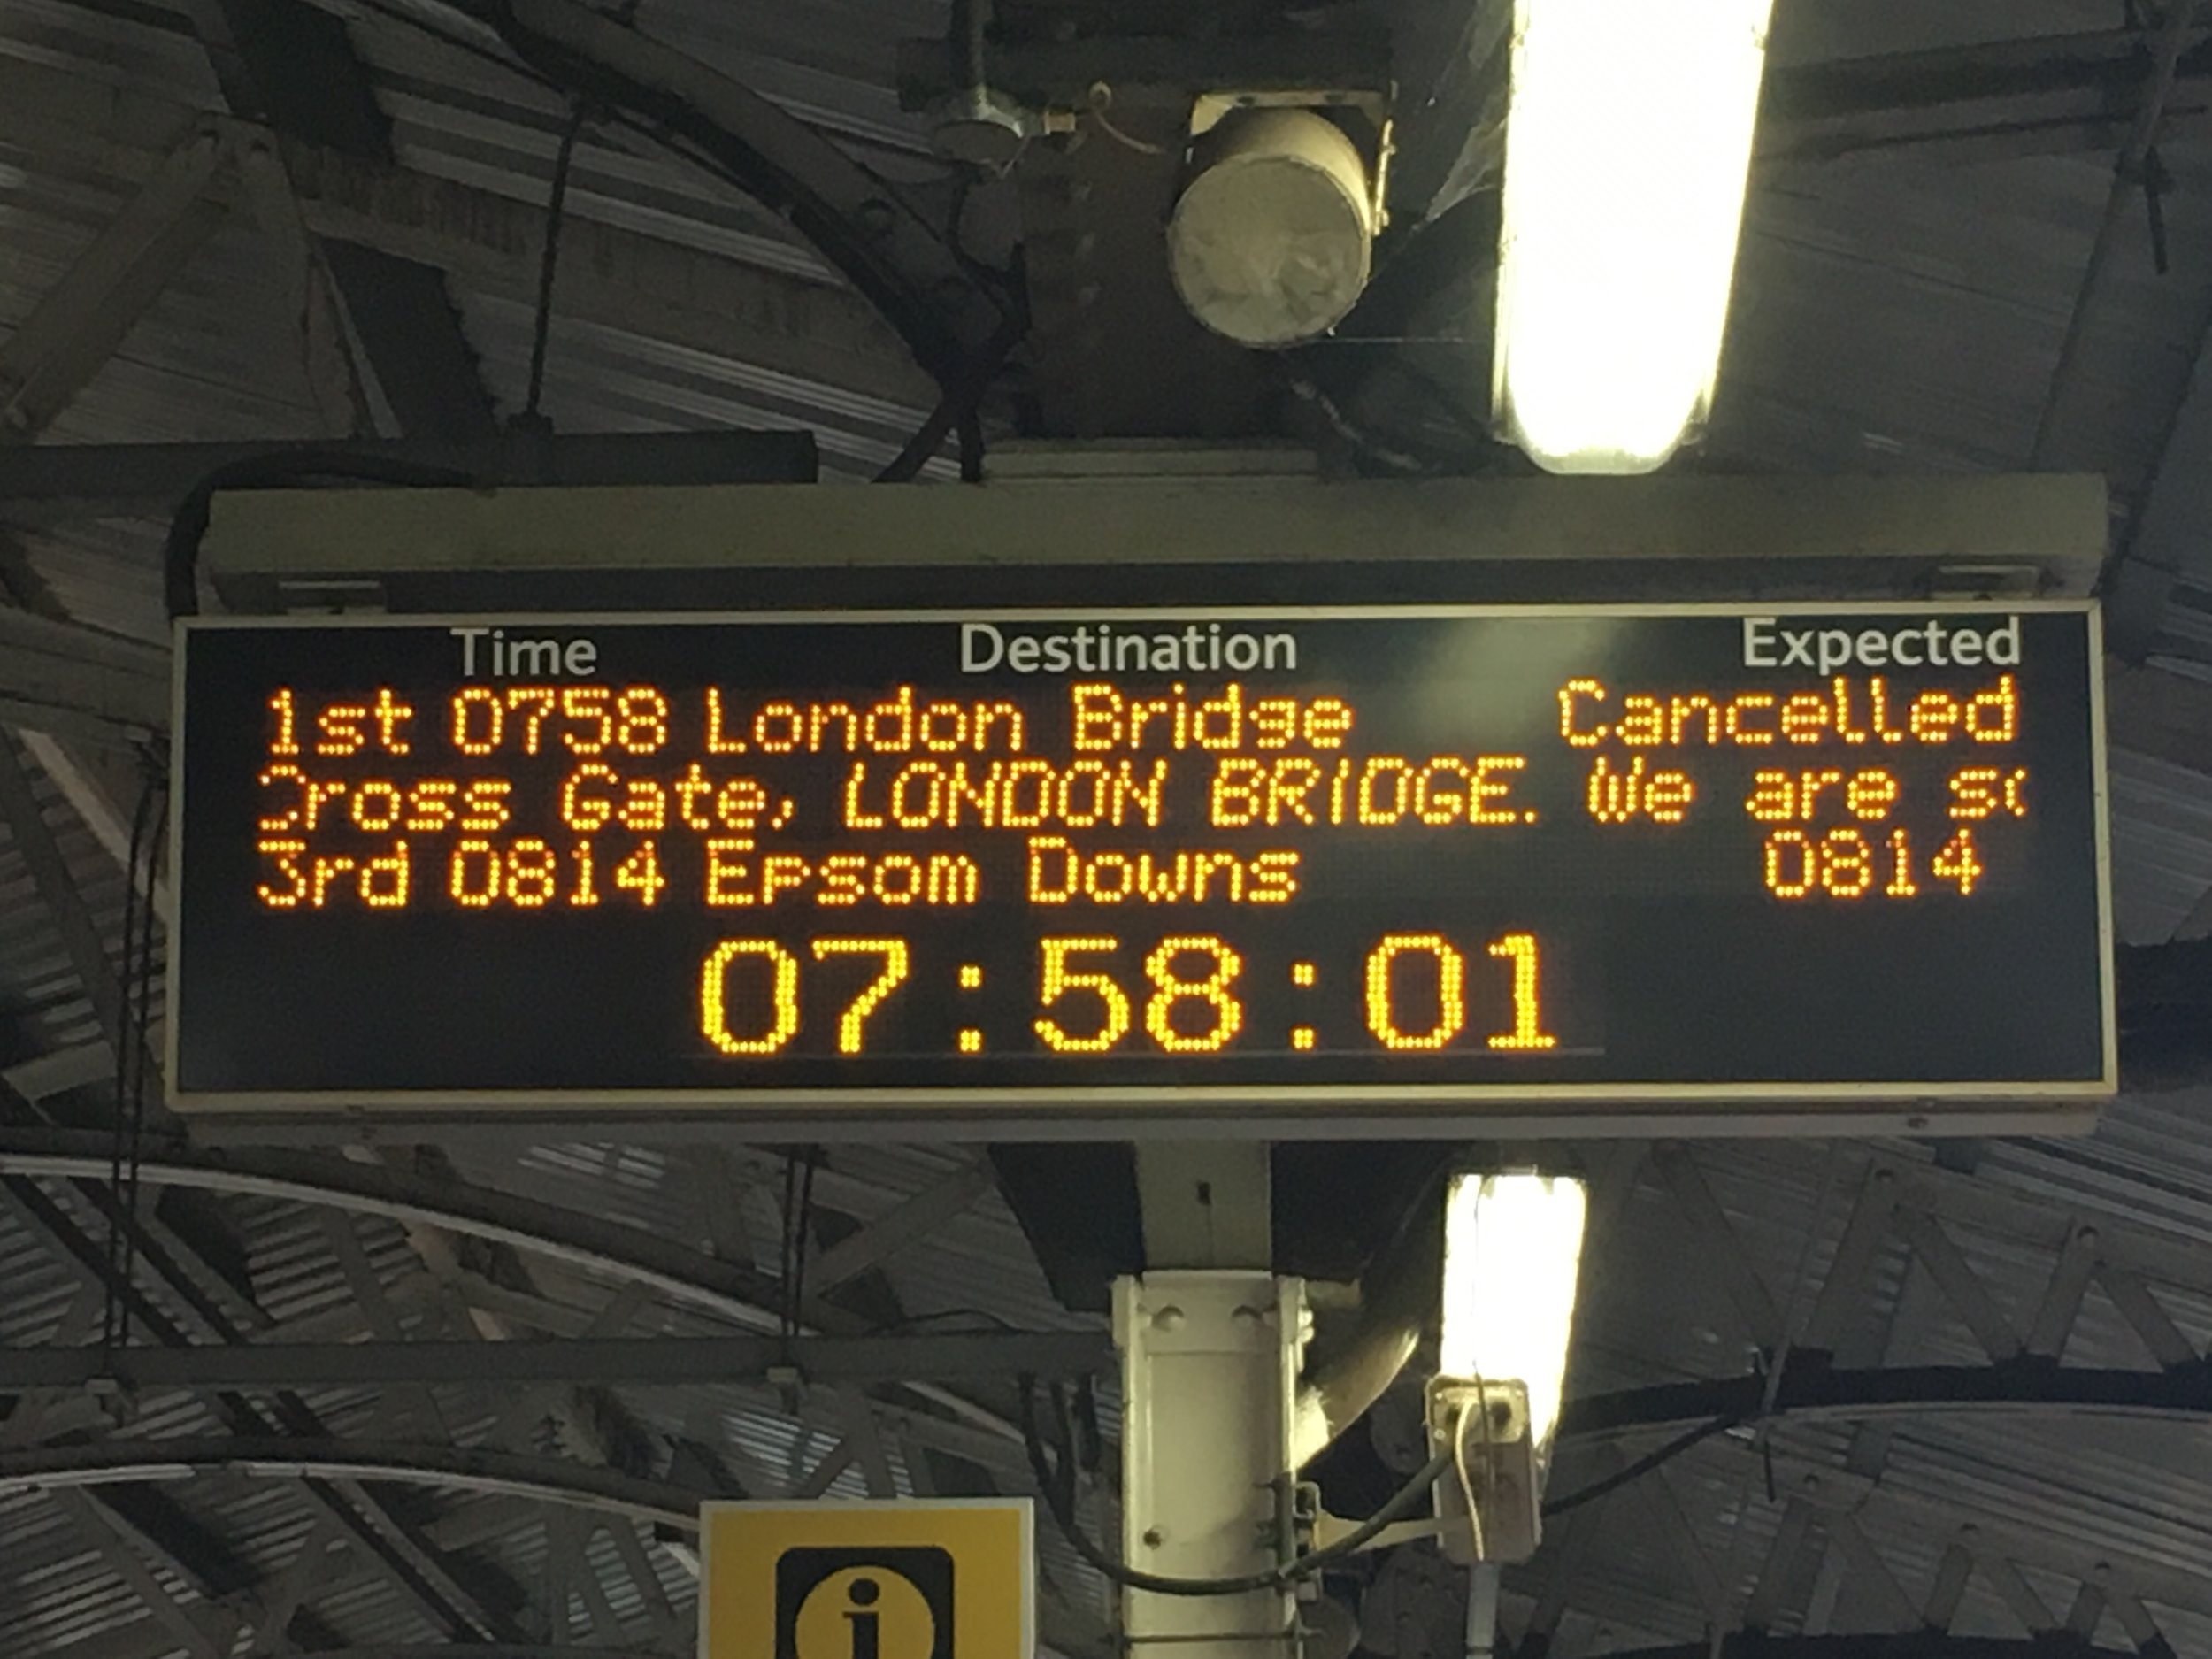 Week of cancelled trains & train strikes